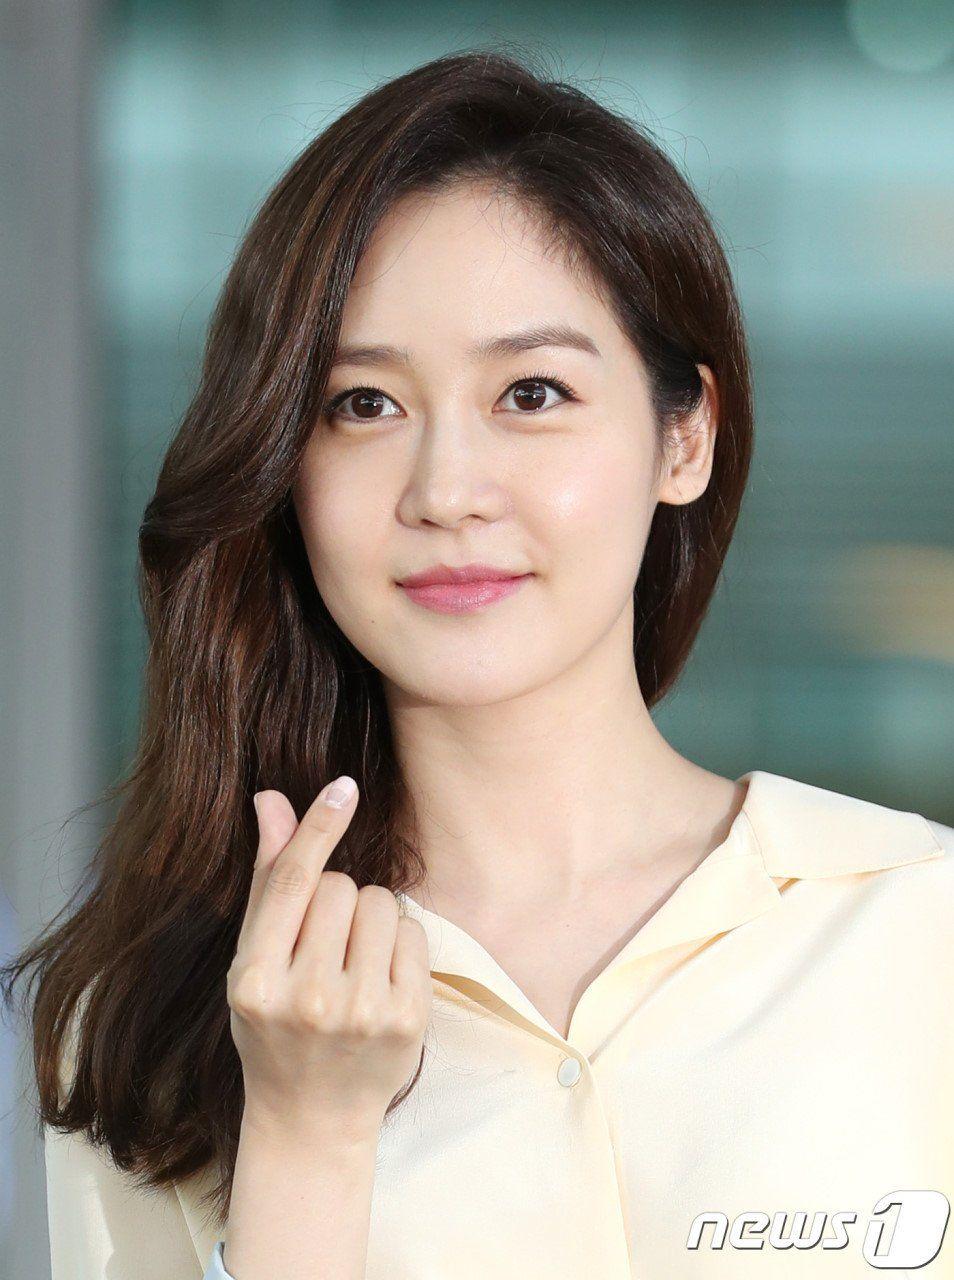 Sung Yuri (성유리) Picture HanCinema The Korean Movie